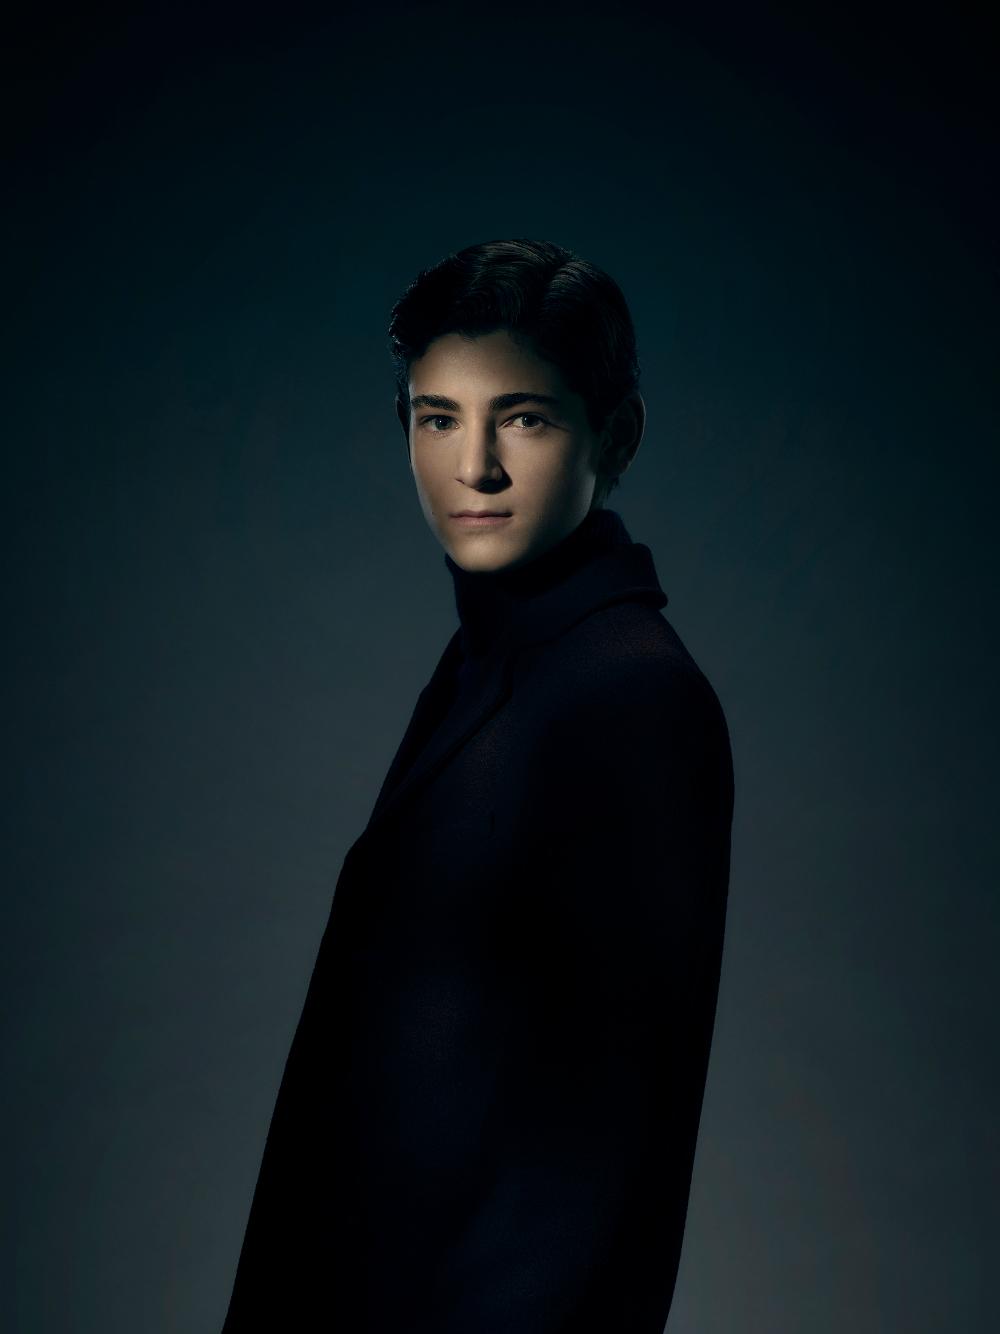 Gotham - Bruce Wayne